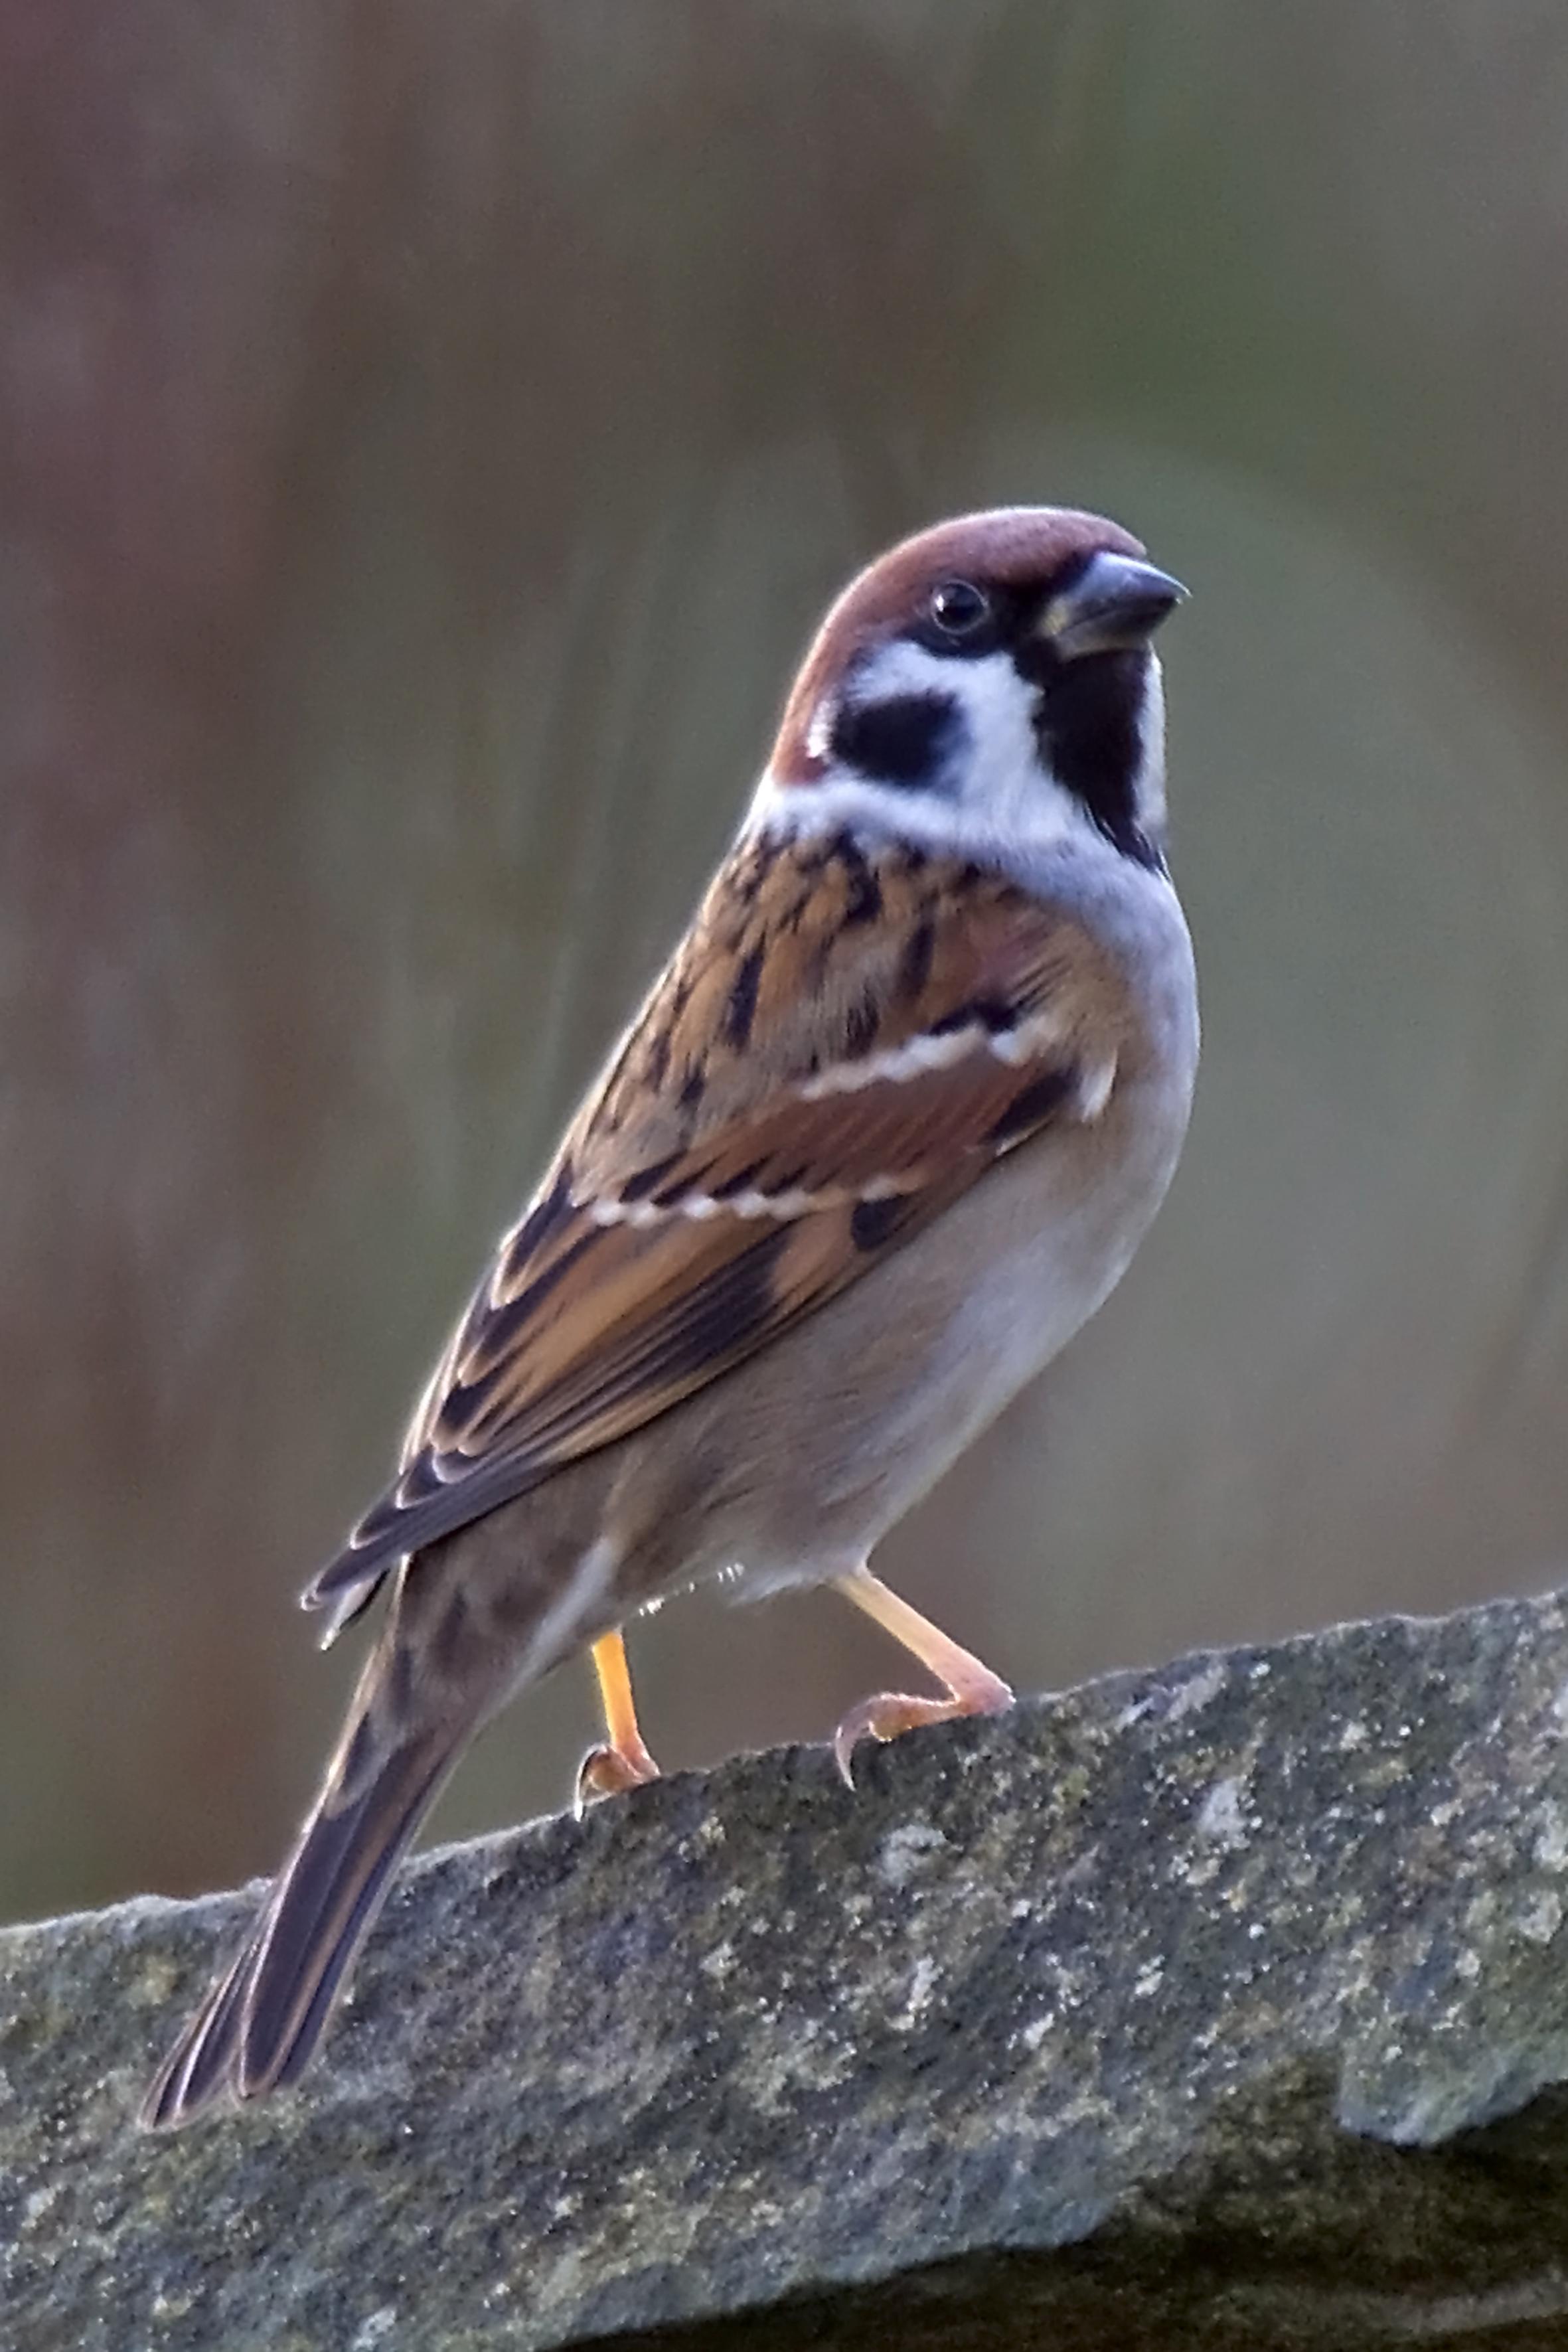 Raising Of Sparrow Pictures : happy sparrow bird sparrow sparrow mus pictures birds bird photos ...